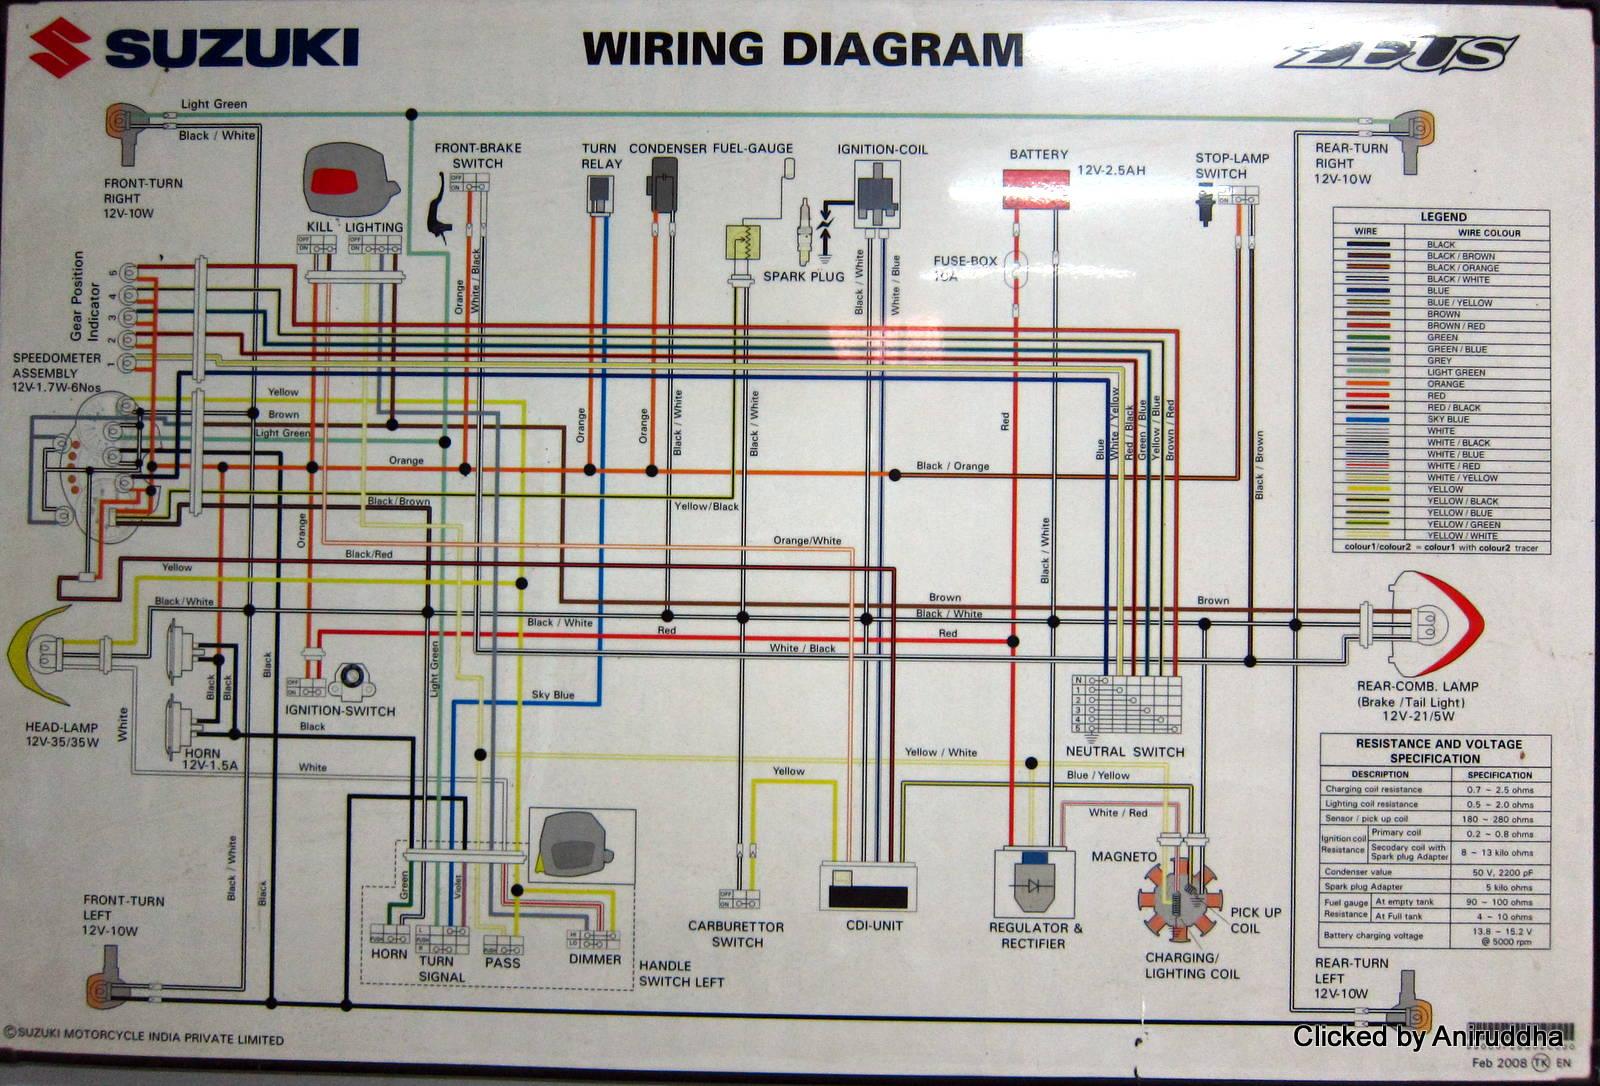 honda 125 motorcycle wiring schematics2009 ek 1277  gs 125 cdi wiring schematic wiring  ek 1277  gs 125 cdi wiring schematic wiring